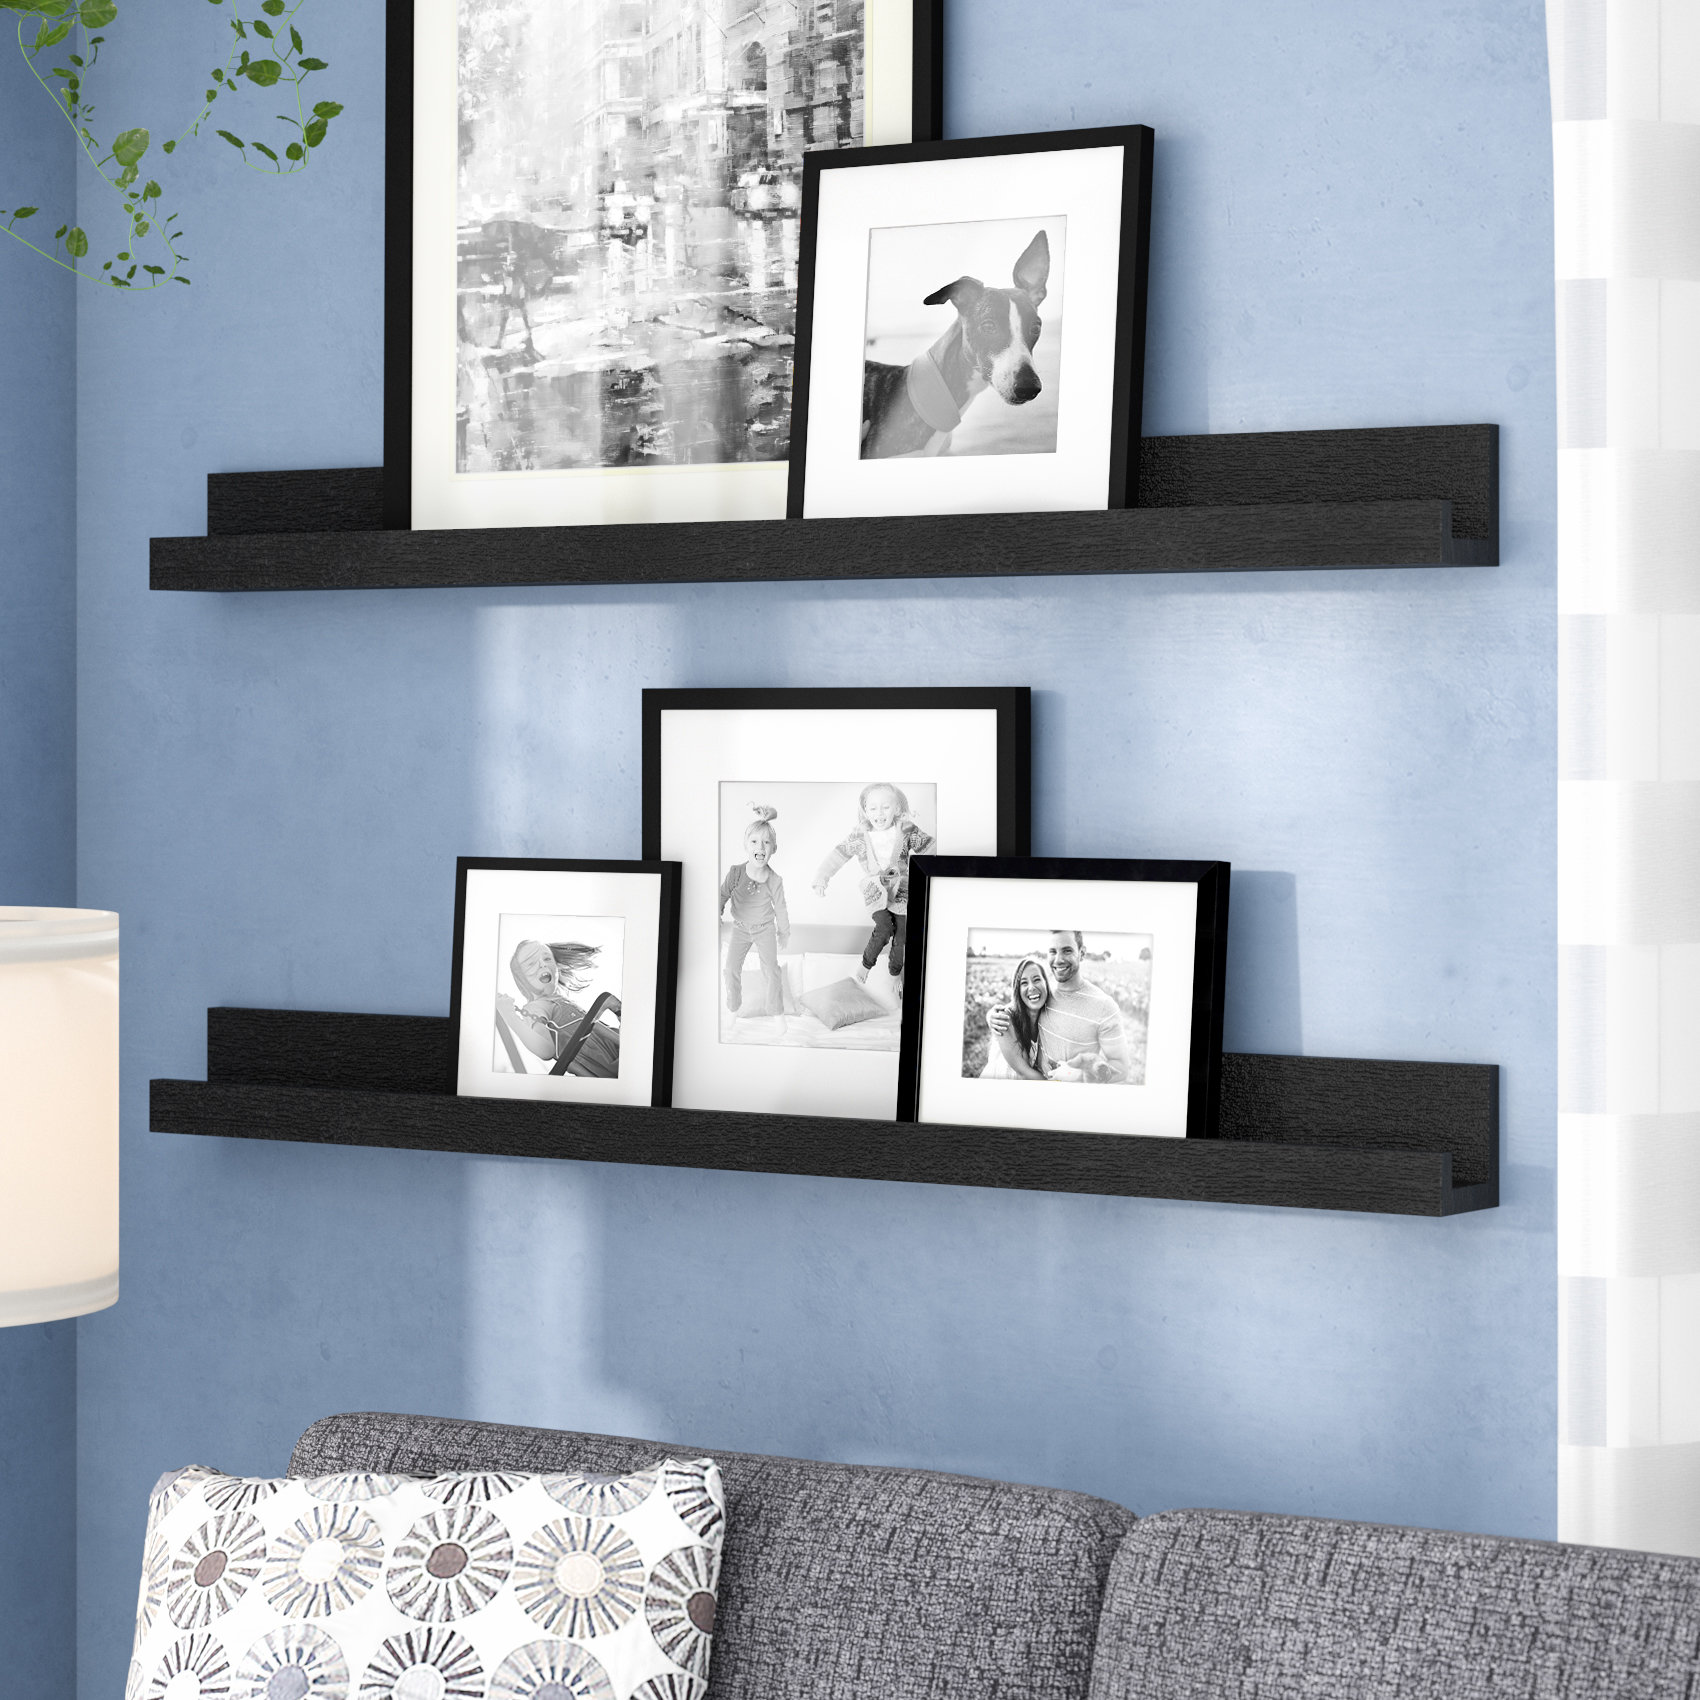 red barrel studio dulin ledge ture display floating shelf shelves for frames reviews chimney brush bedroom furniture interesting ideas industrial style shelving inch wide heavy